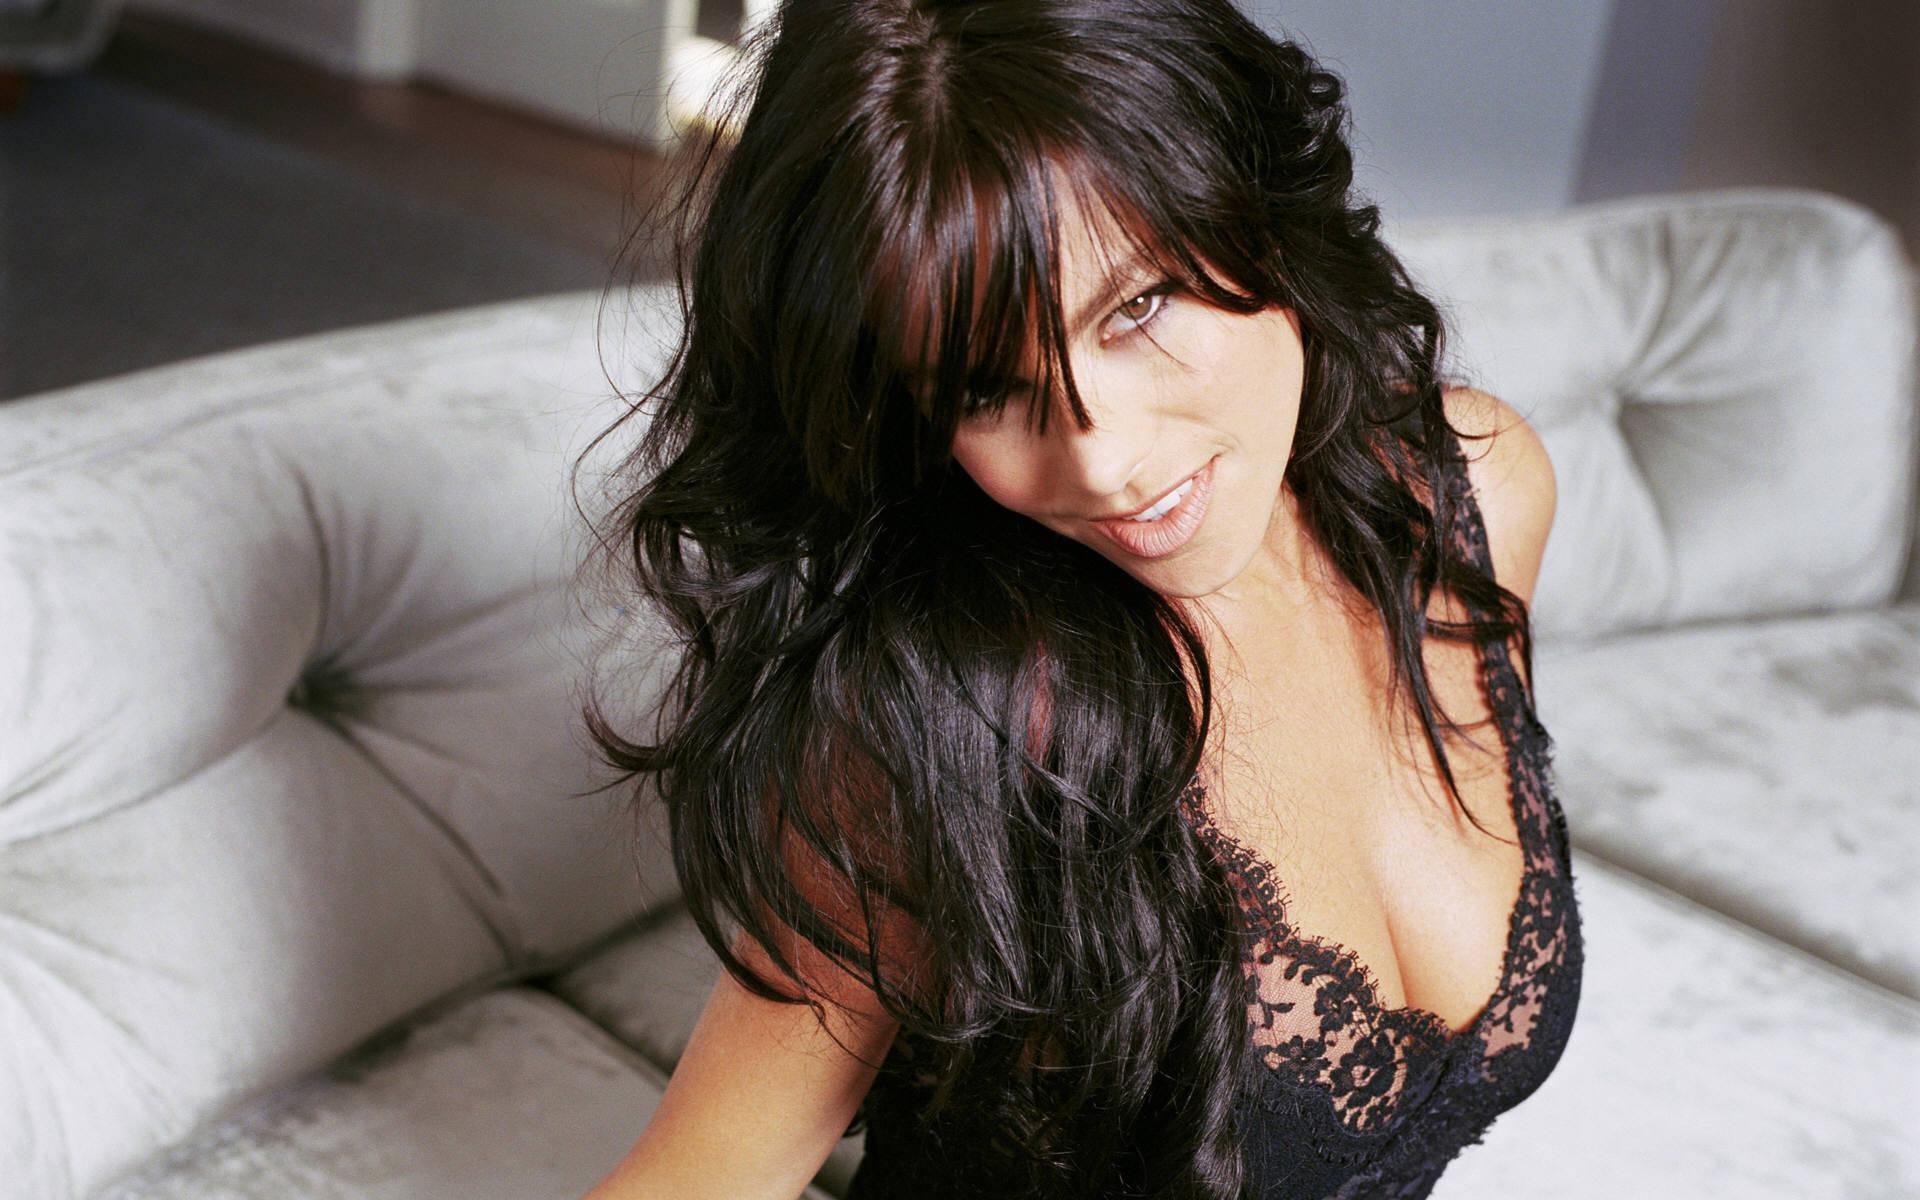 Sexy Women sofia105 Dersimo's blog Breast Feeding Tits, Small